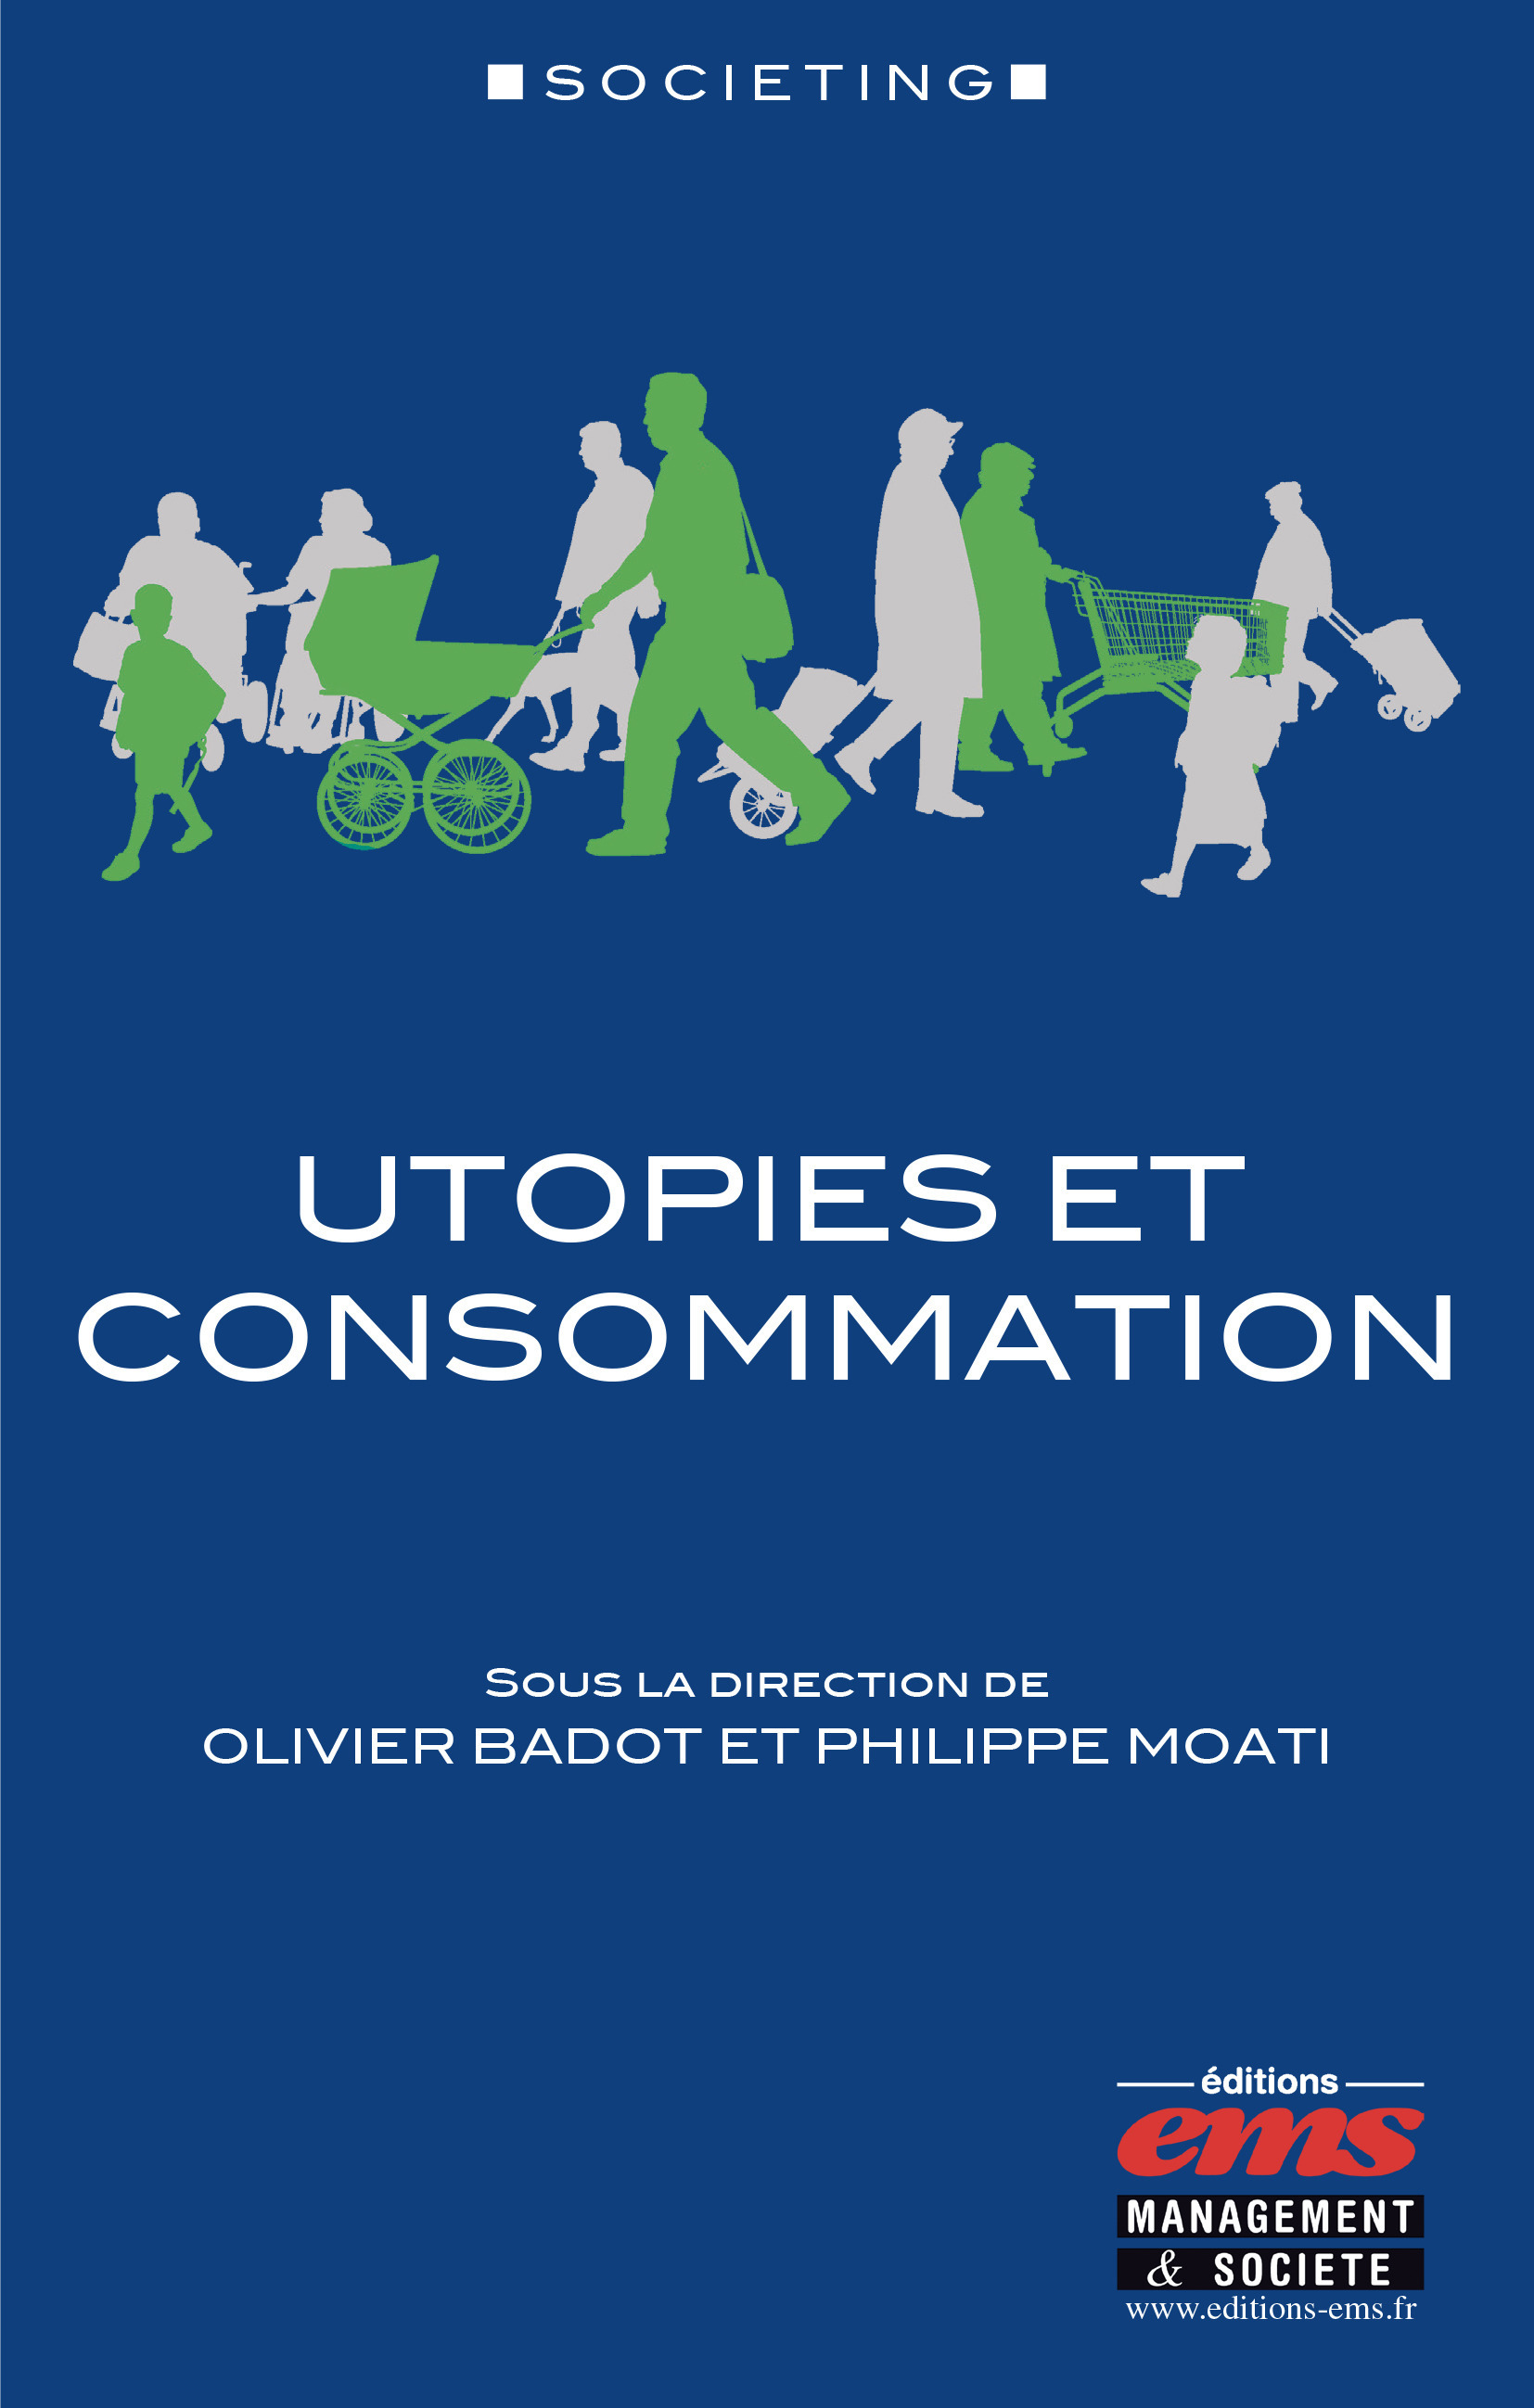 Consommation et utopies